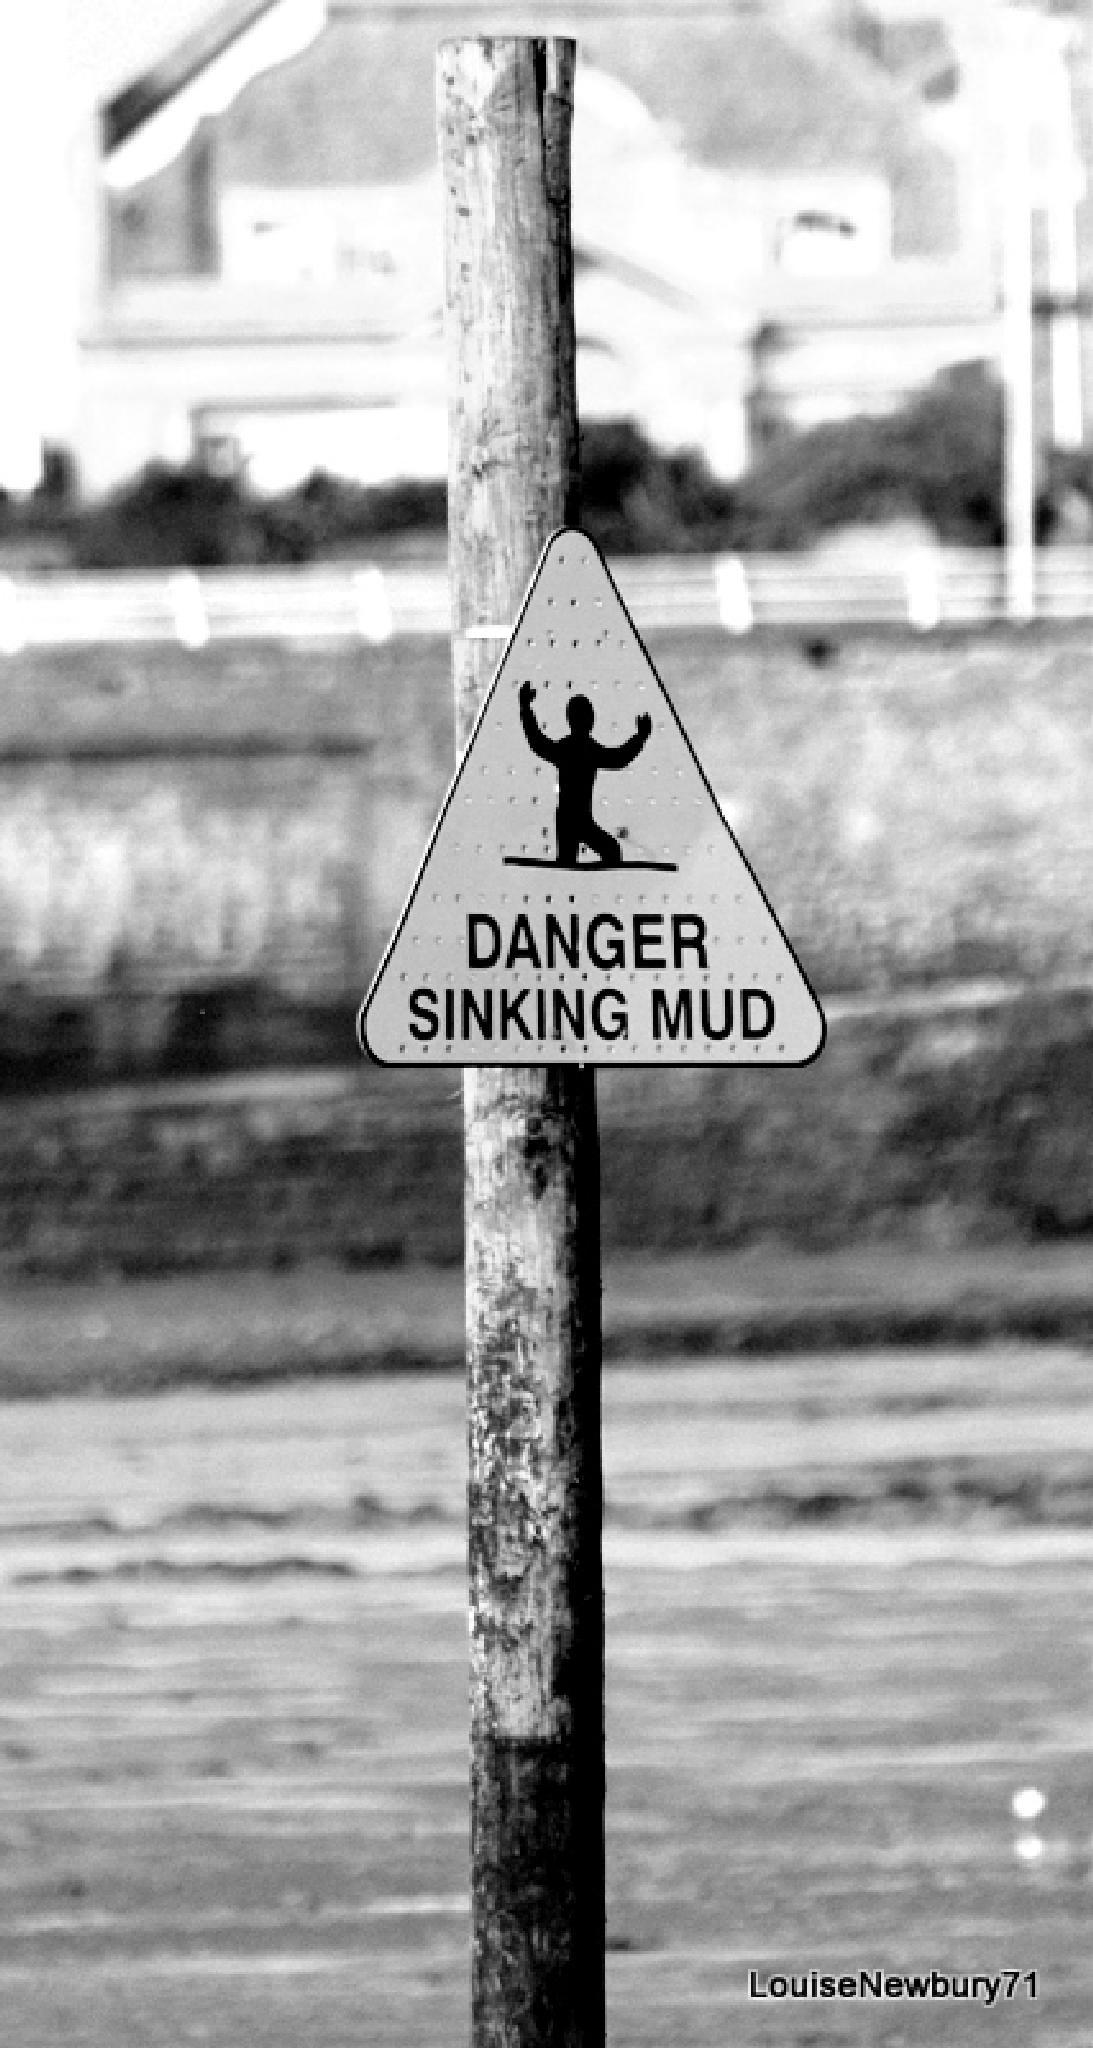 Sinking mud by louise.newbury